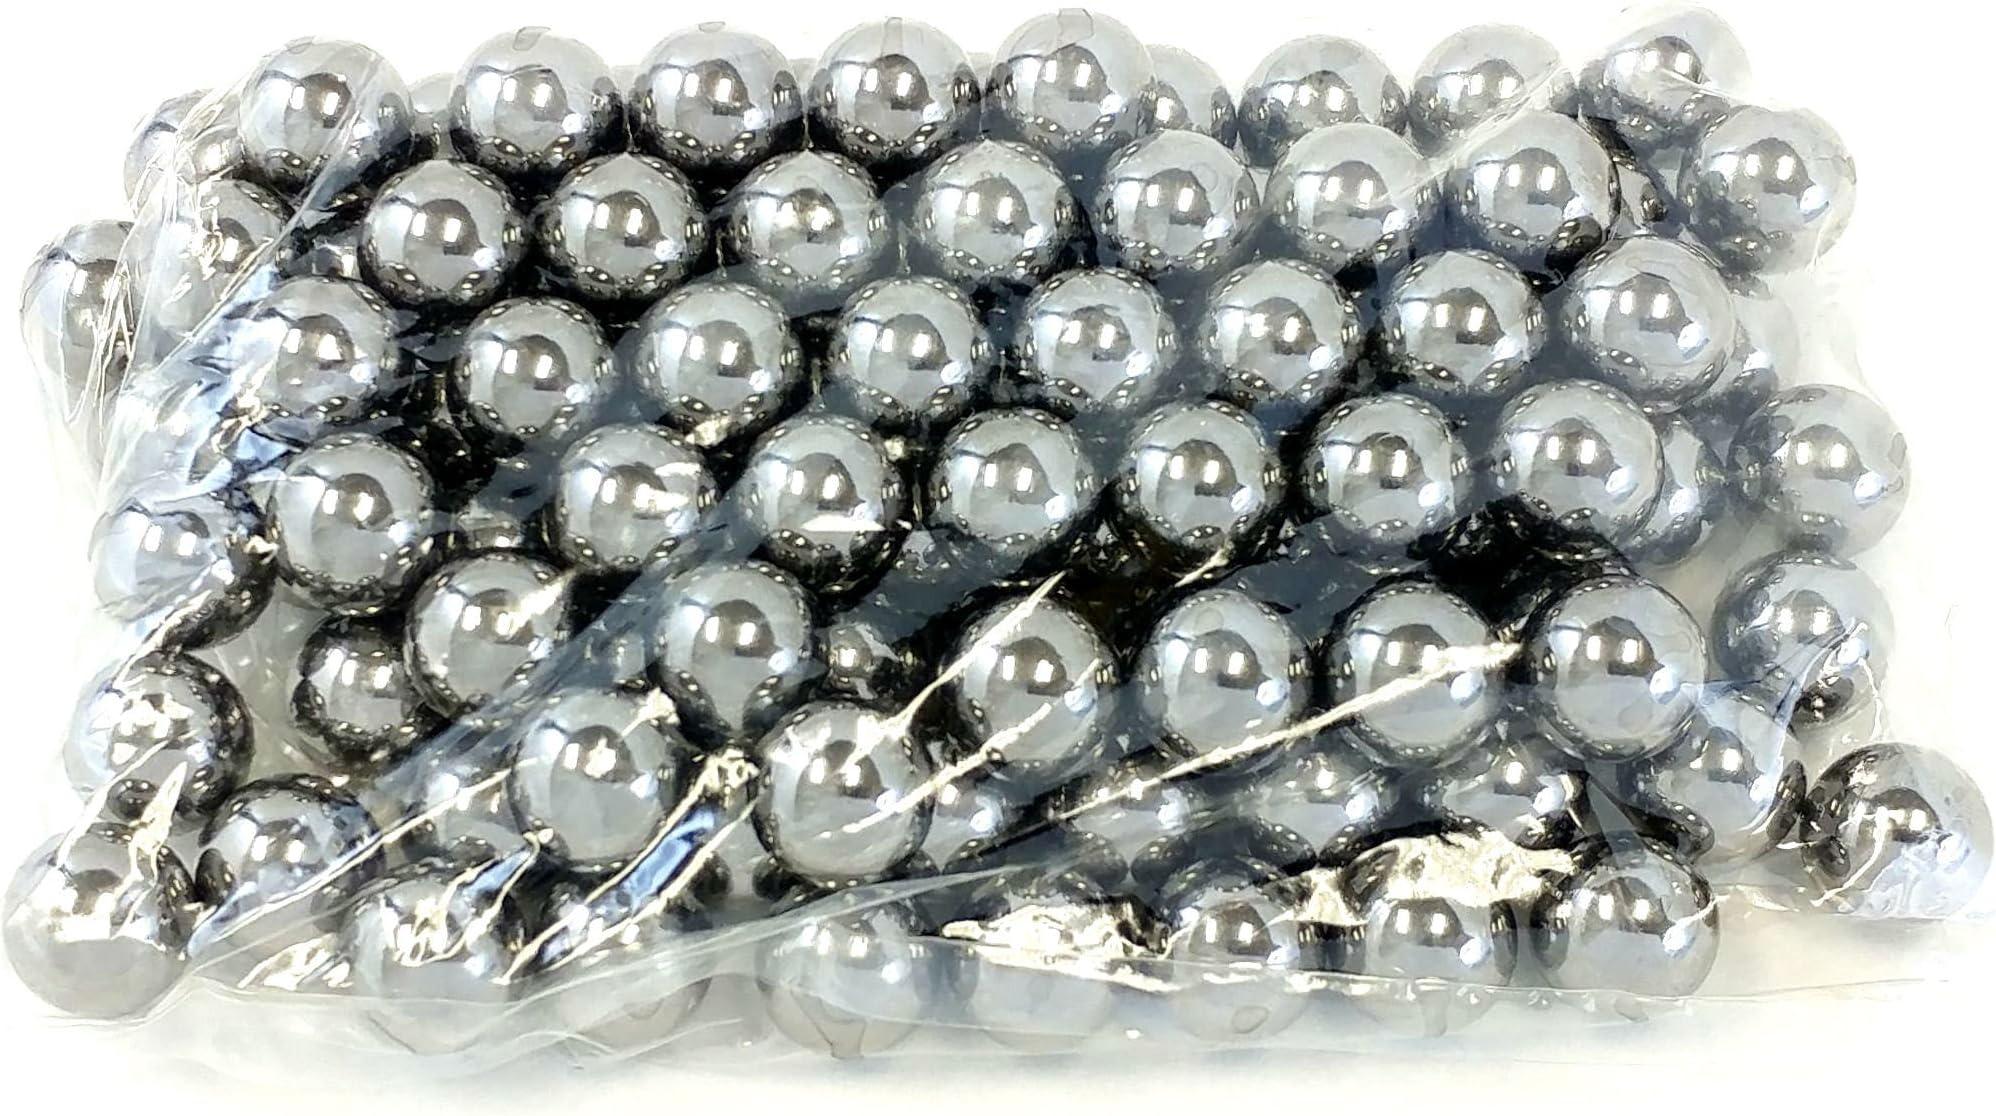 SLINGSHOT AMMO CARBON STEEL BALL BEARINGS CHOOSE SIZE PACK OF 1000 CATAPULT